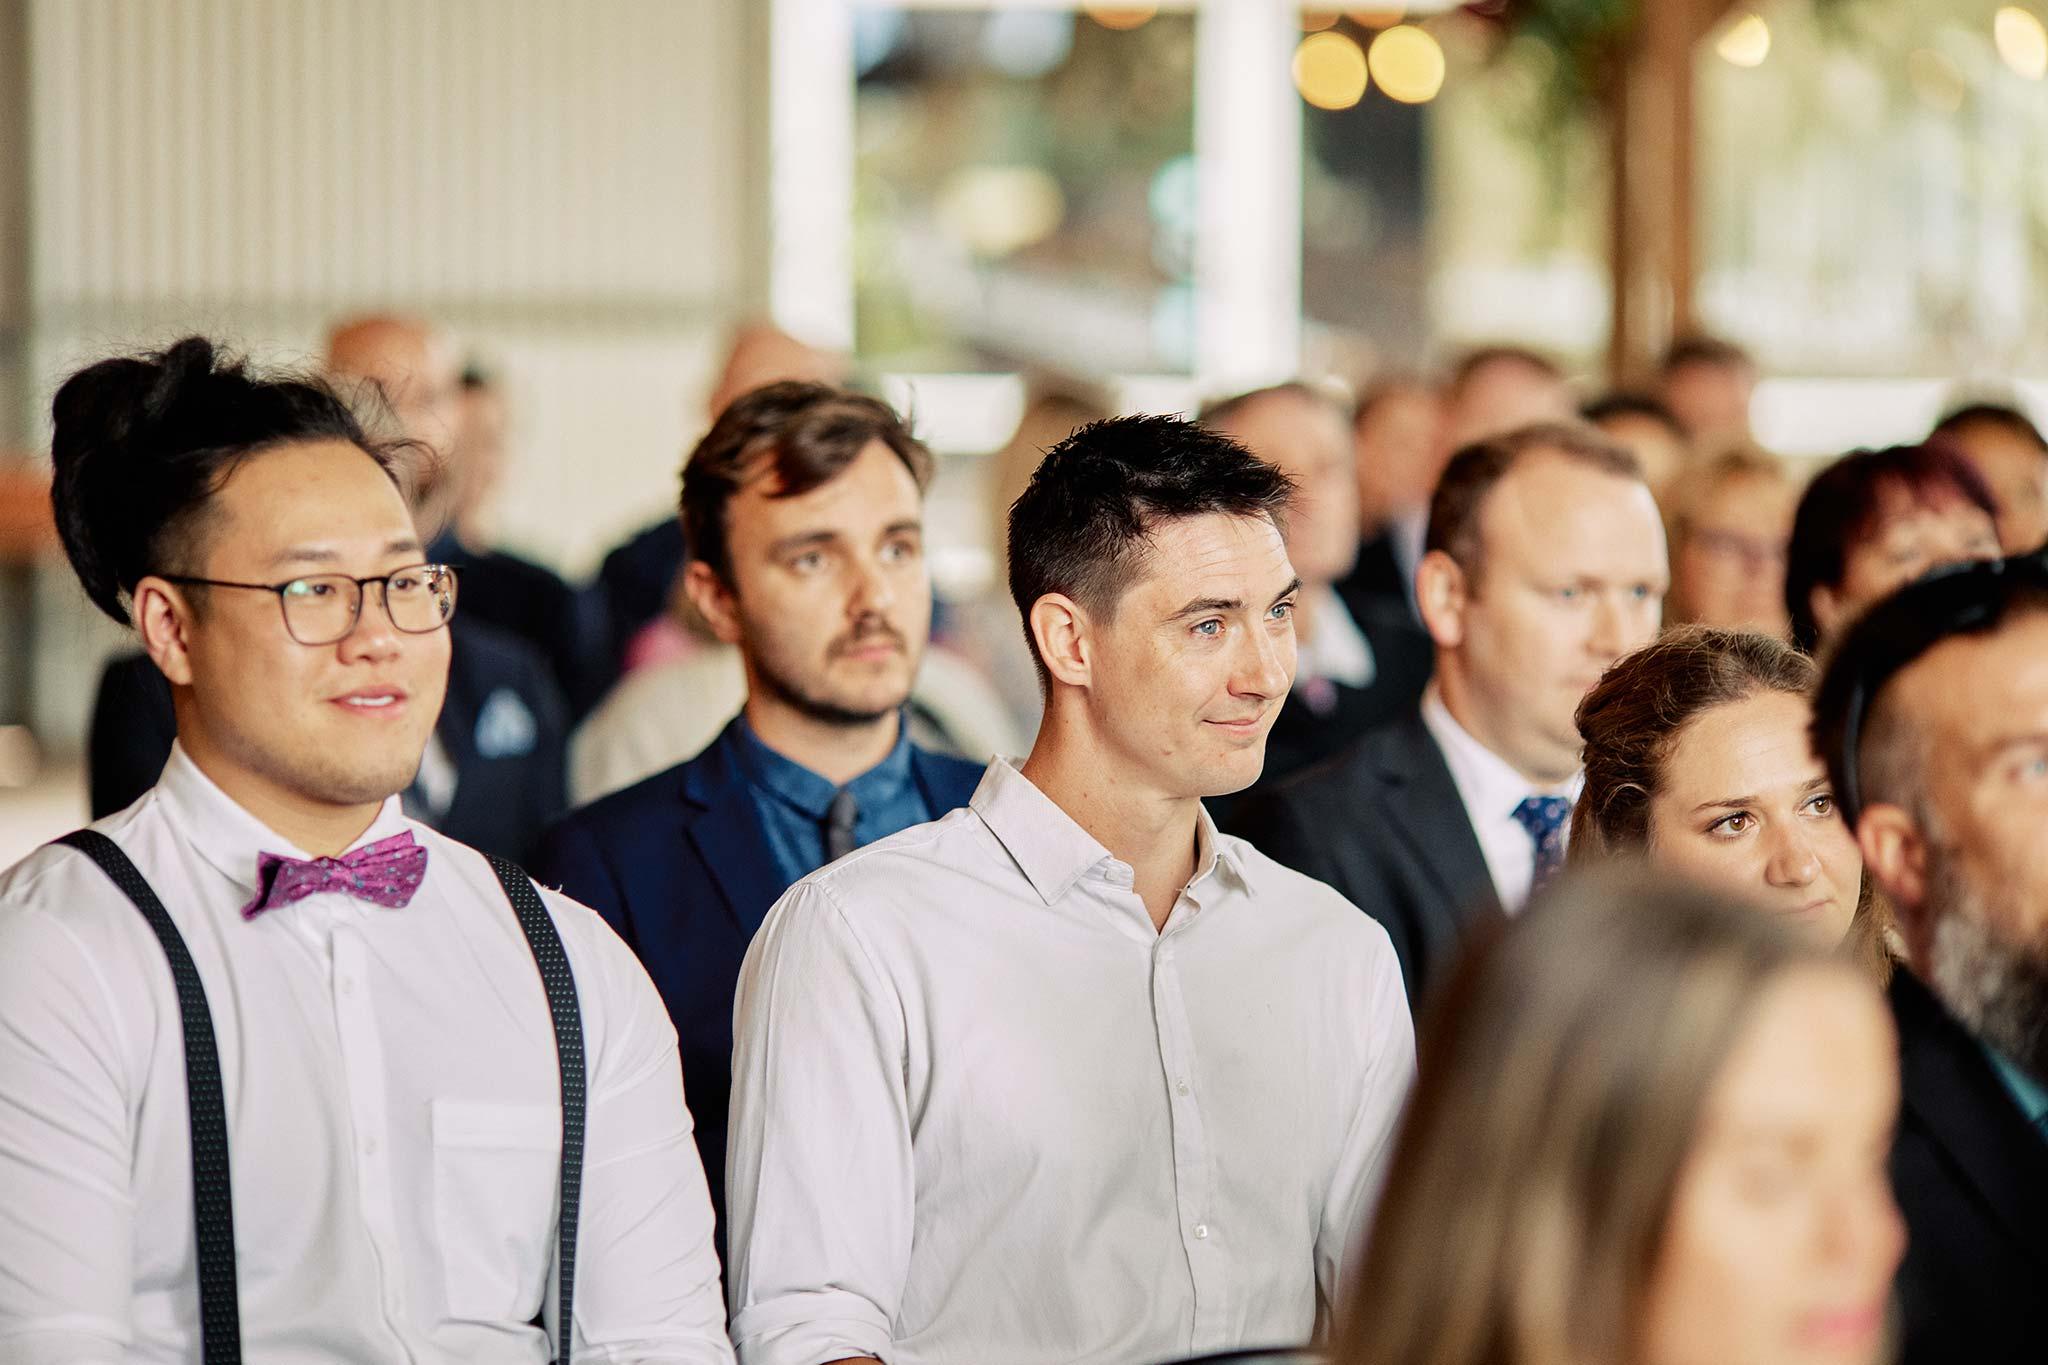 Zonzo estate wedding ceremony guest reaction